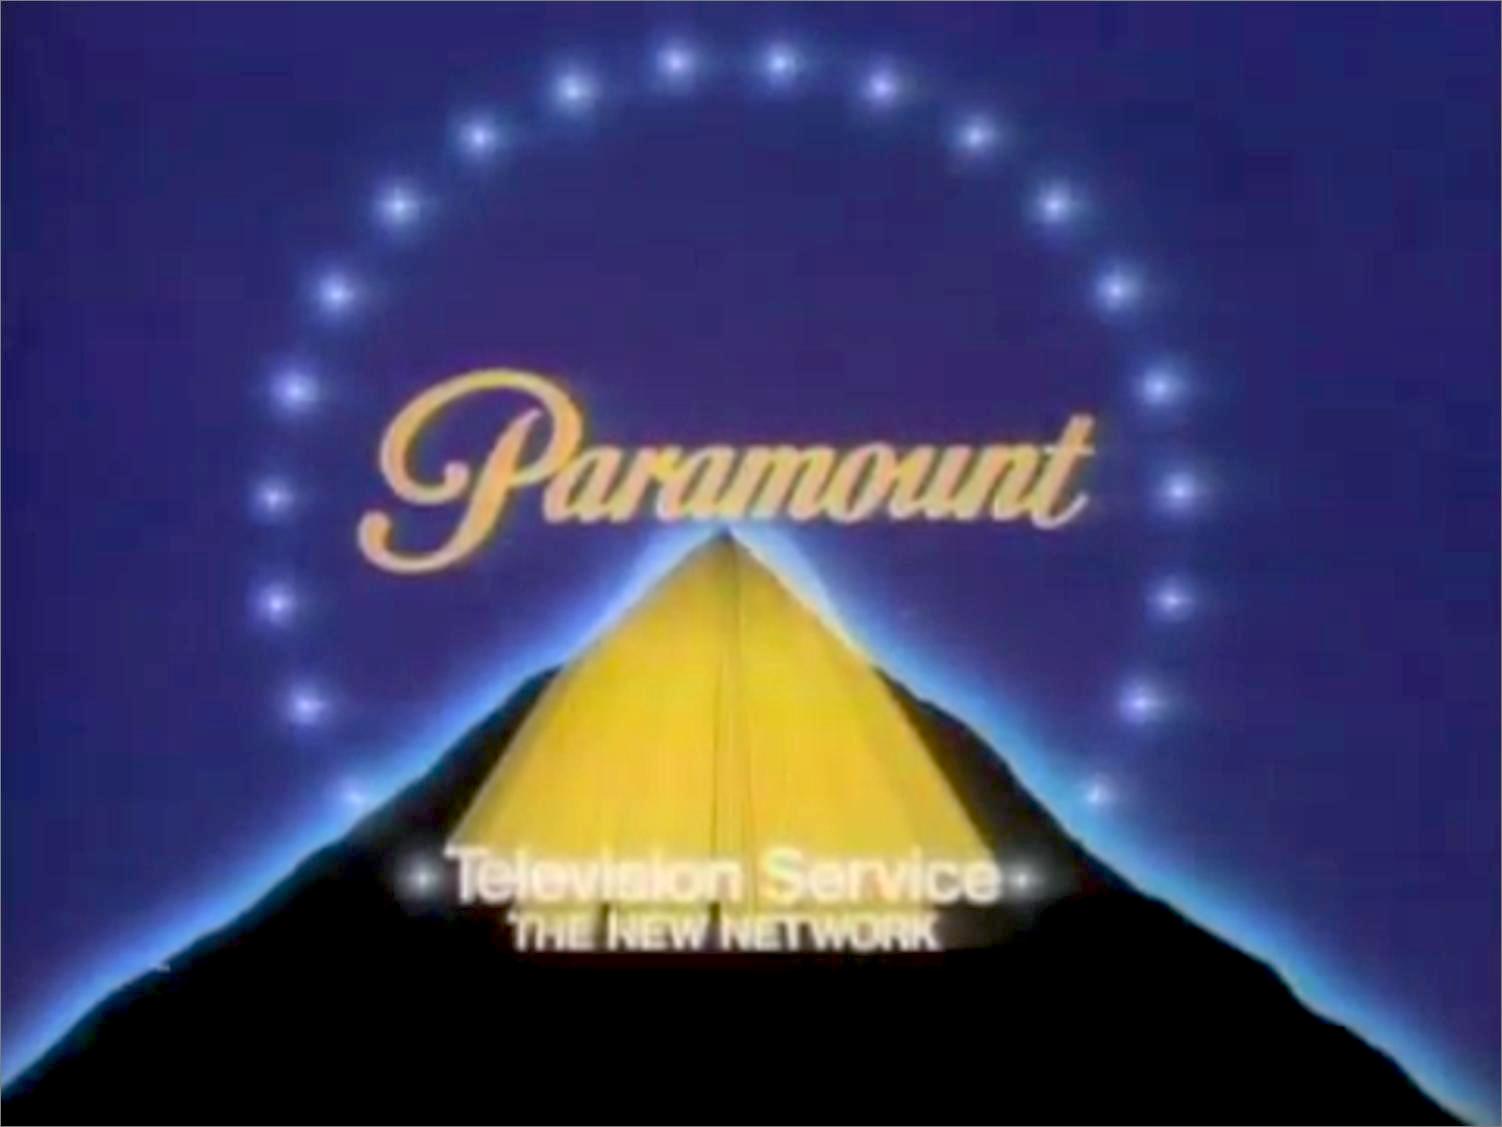 Paramount Television Service Logopedia The Logo And